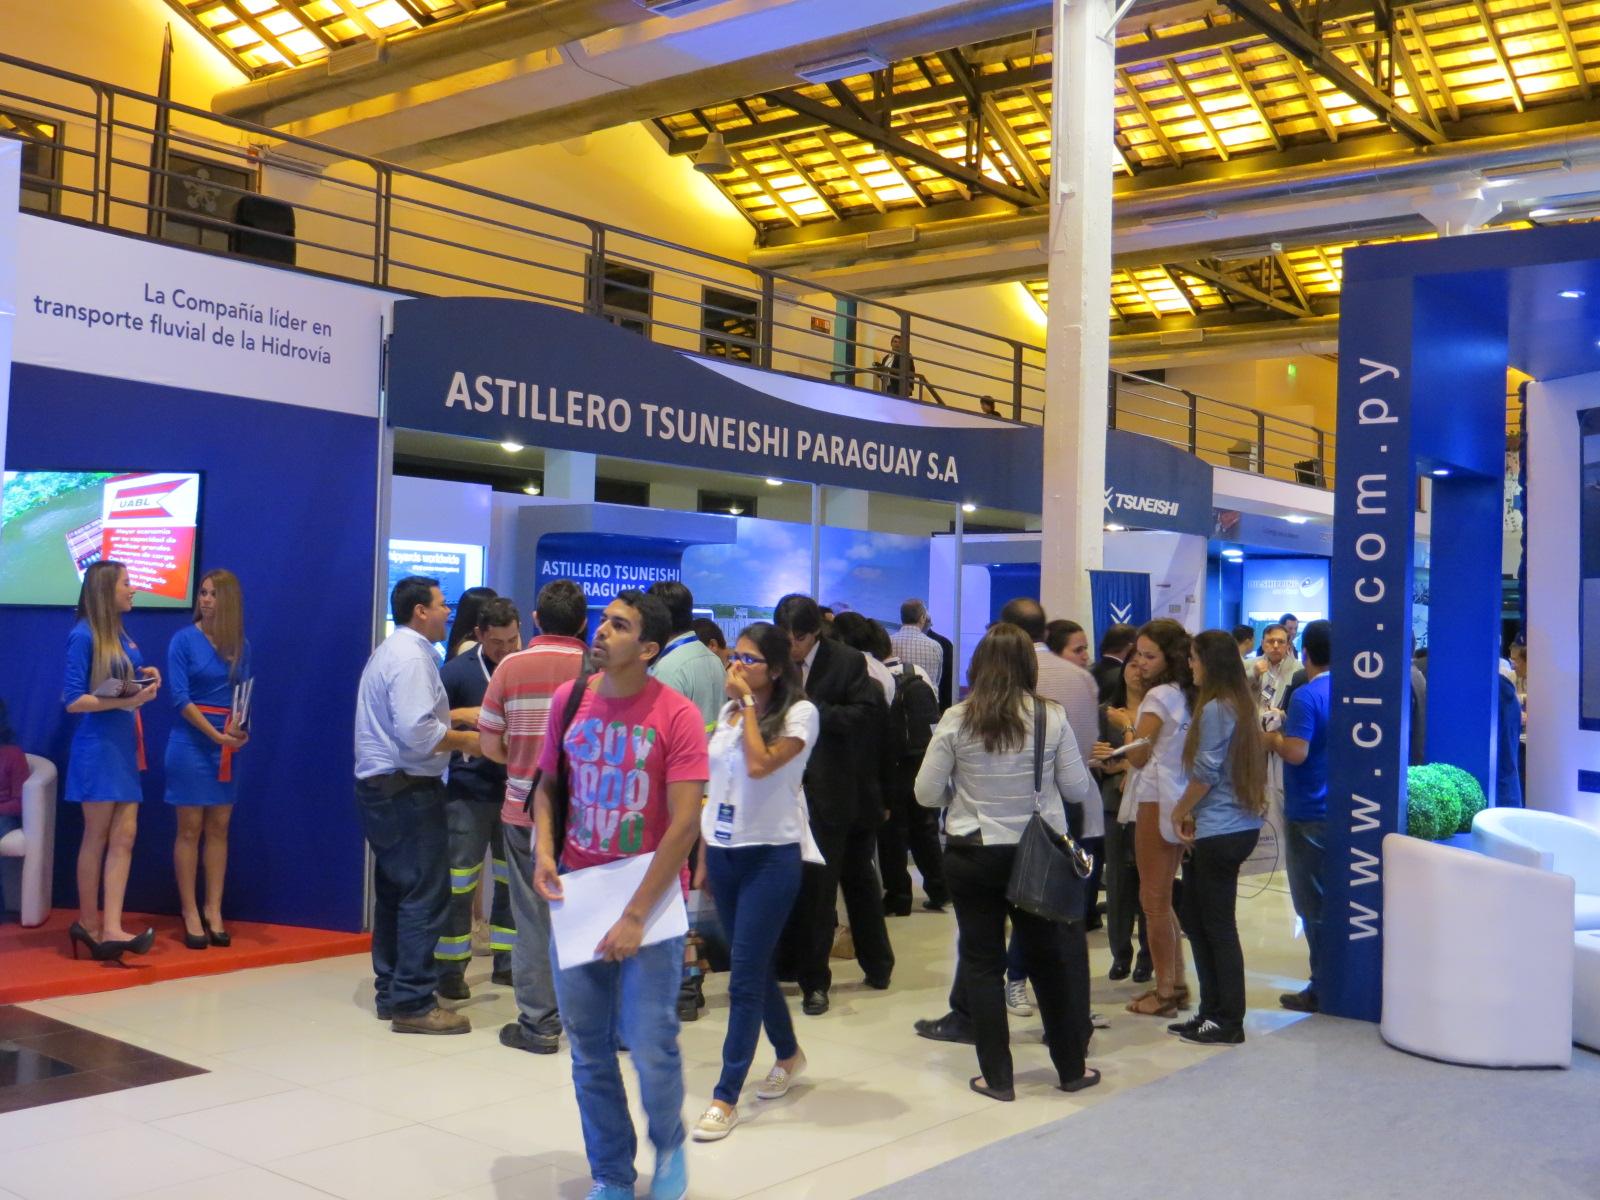 "ASTILLERO TSUNEISHI PARAGUAYがパラグアイ海事展""NAVIGESTIC""に初出展~約4,000人来場の大盛況、穀物バージについての商談も~"